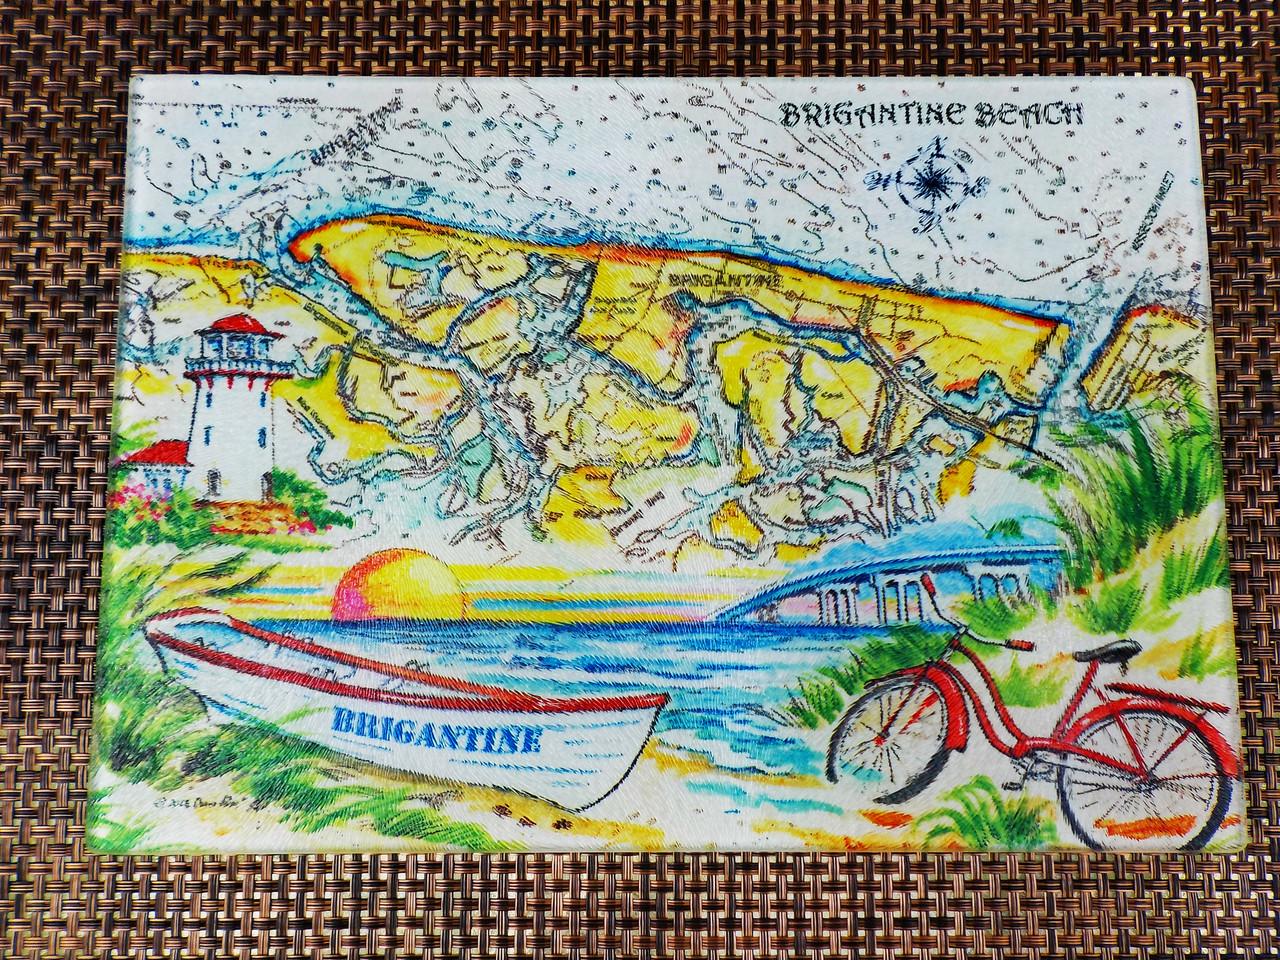 Charting Brigantine Beach copyright Donna Elias